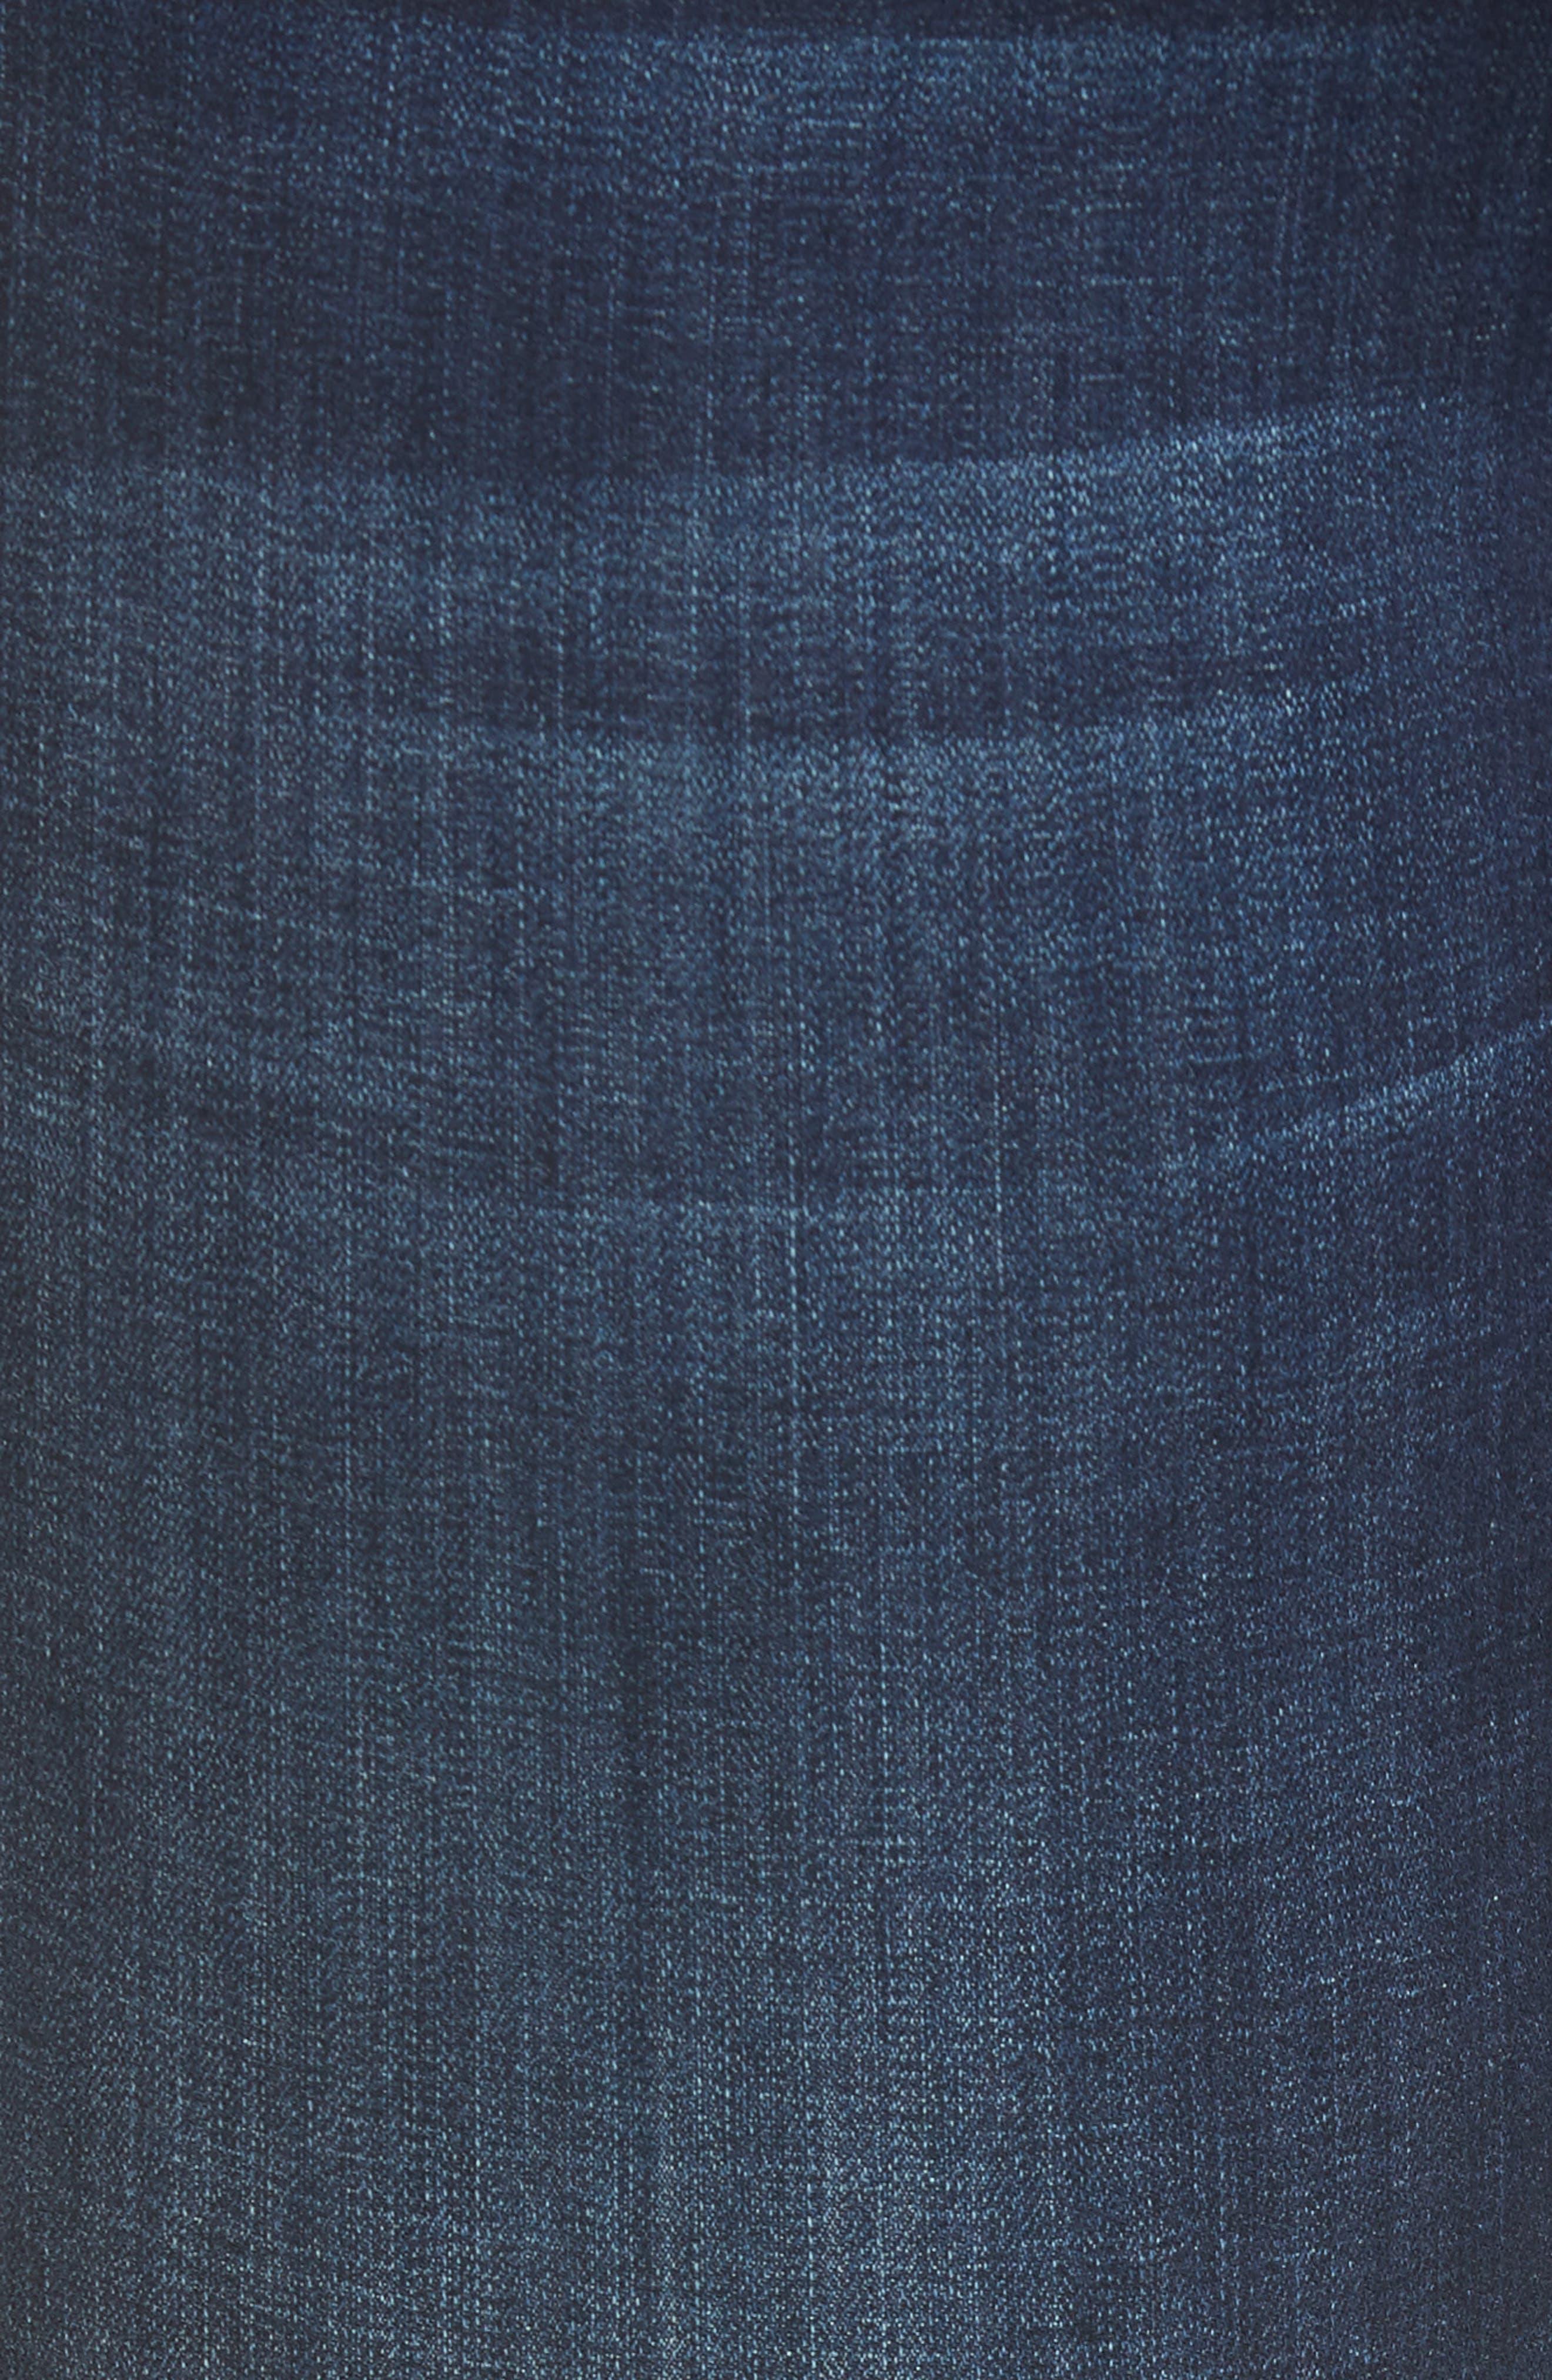 Maddie Cuff Skinny Jeans,                             Alternate thumbnail 6, color,                             Dark Indigo